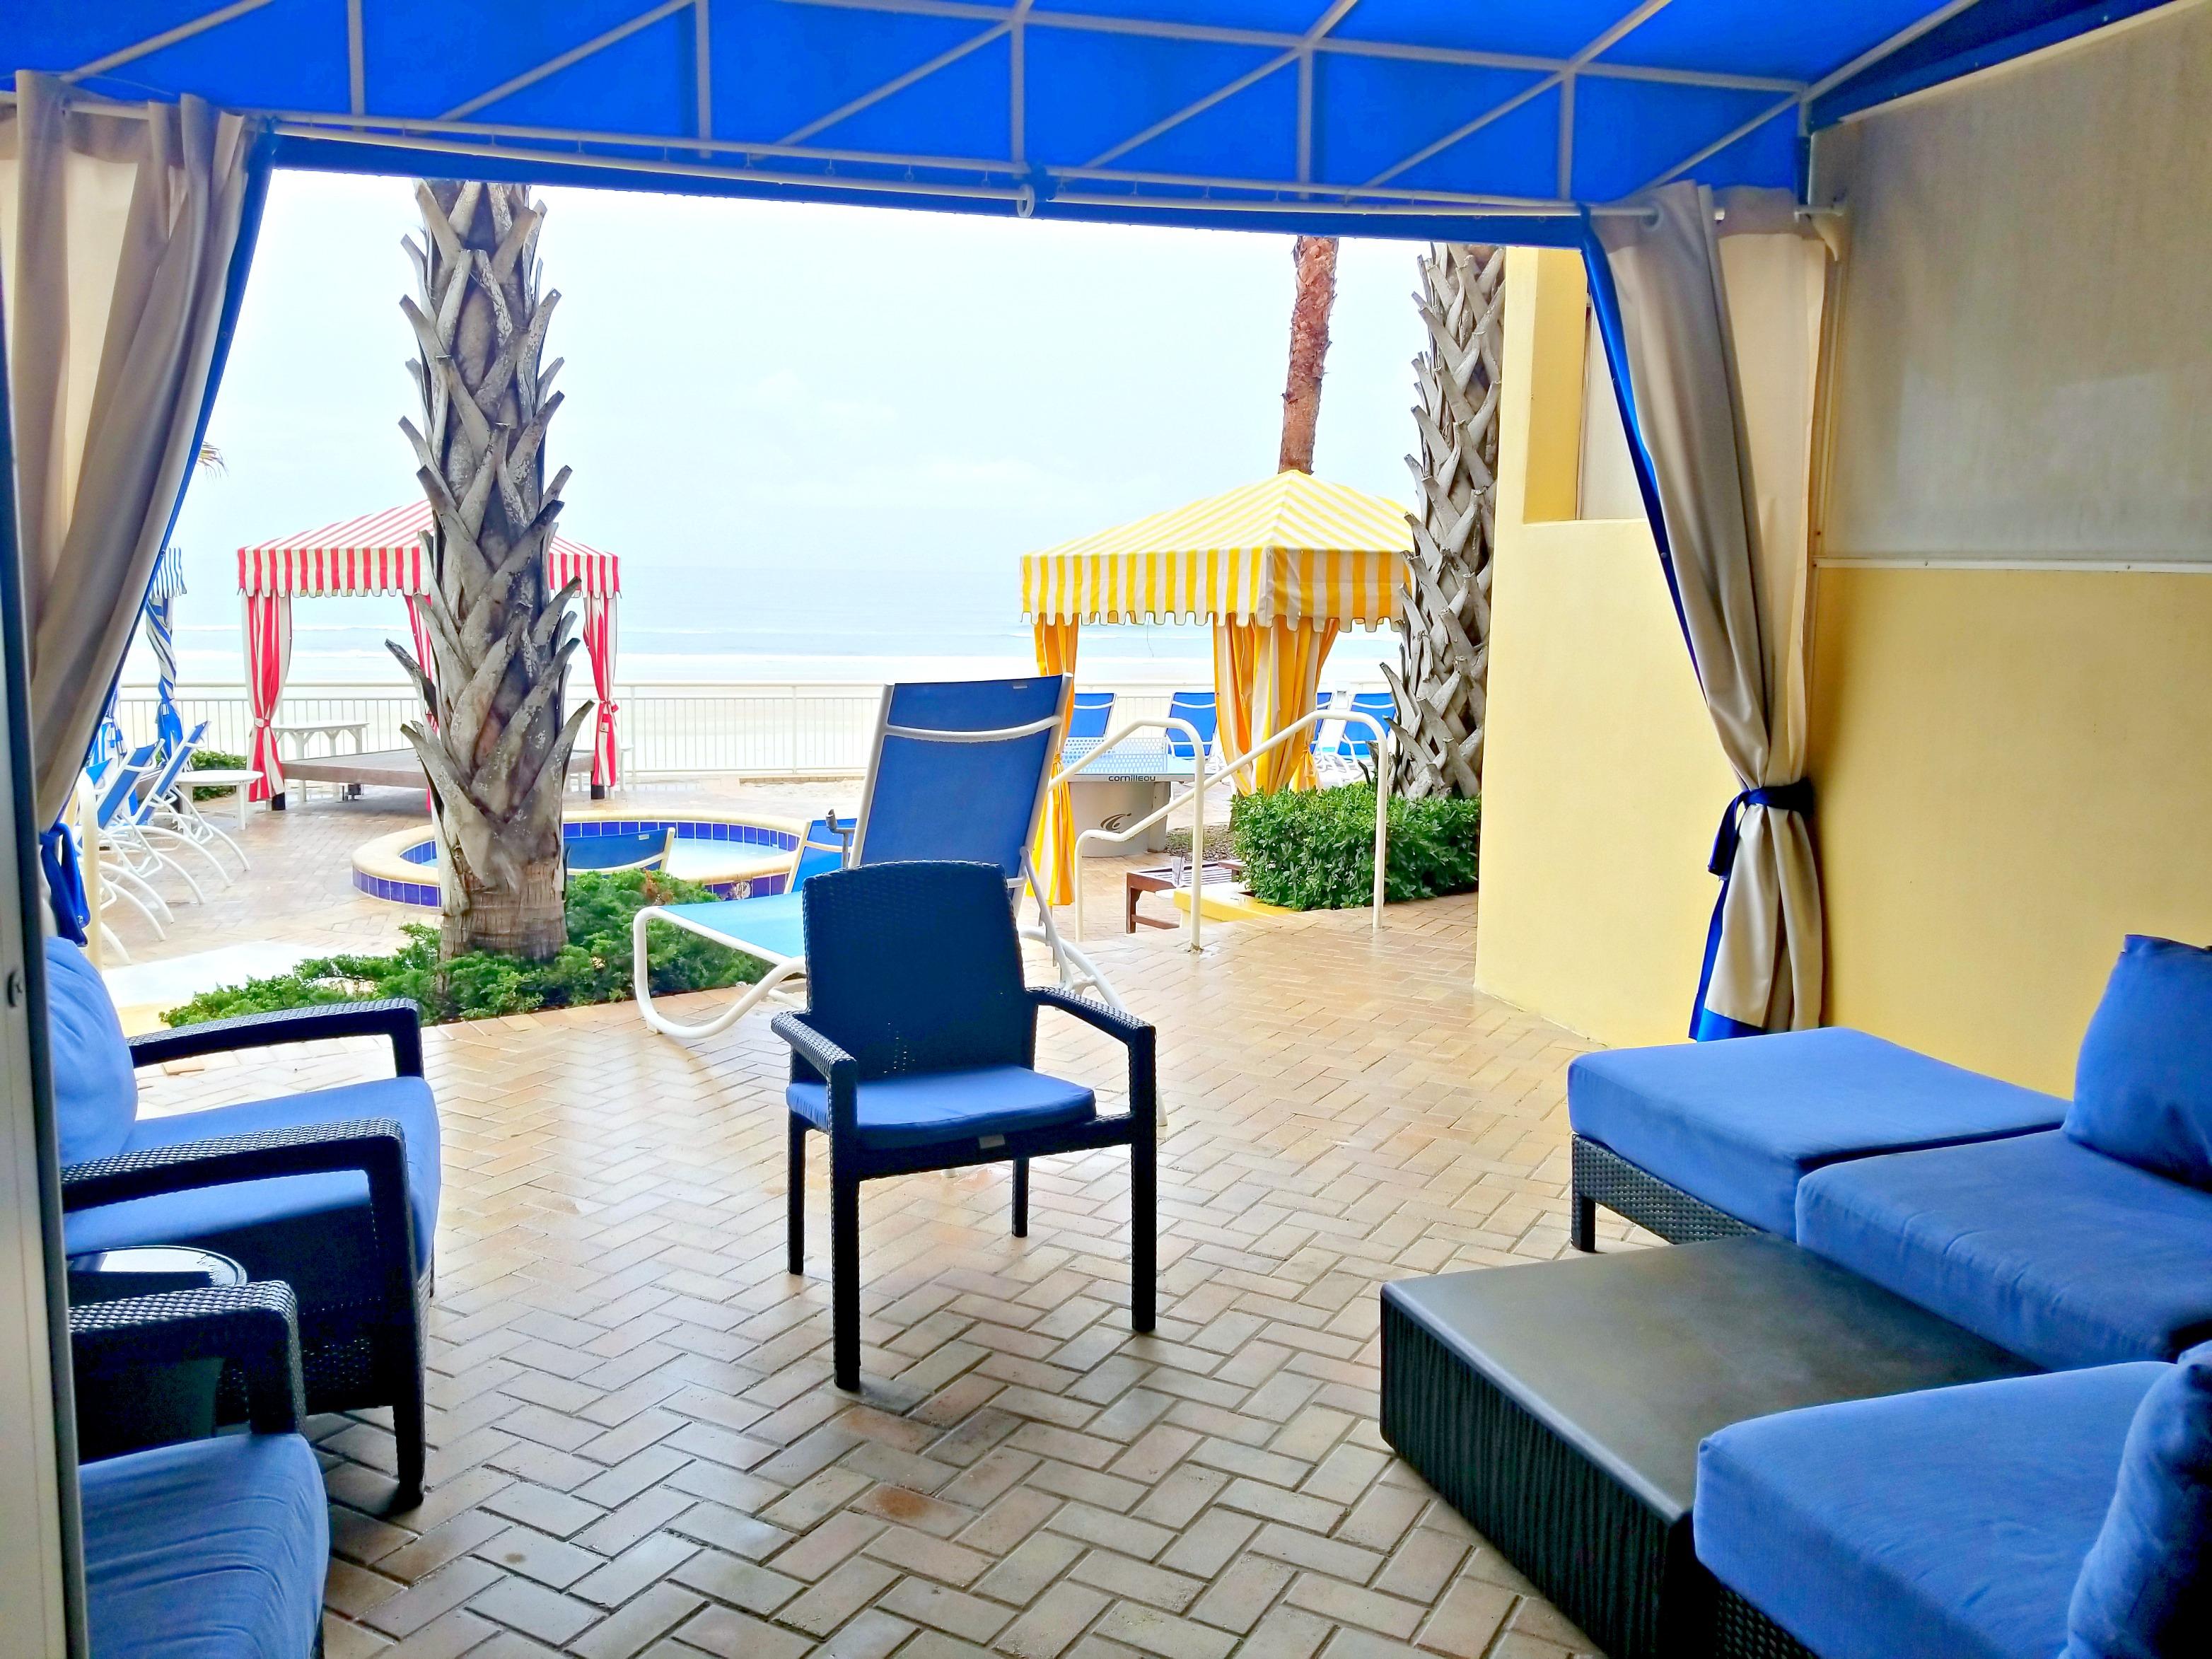 the shores resort spa daytona beach fl review. Black Bedroom Furniture Sets. Home Design Ideas